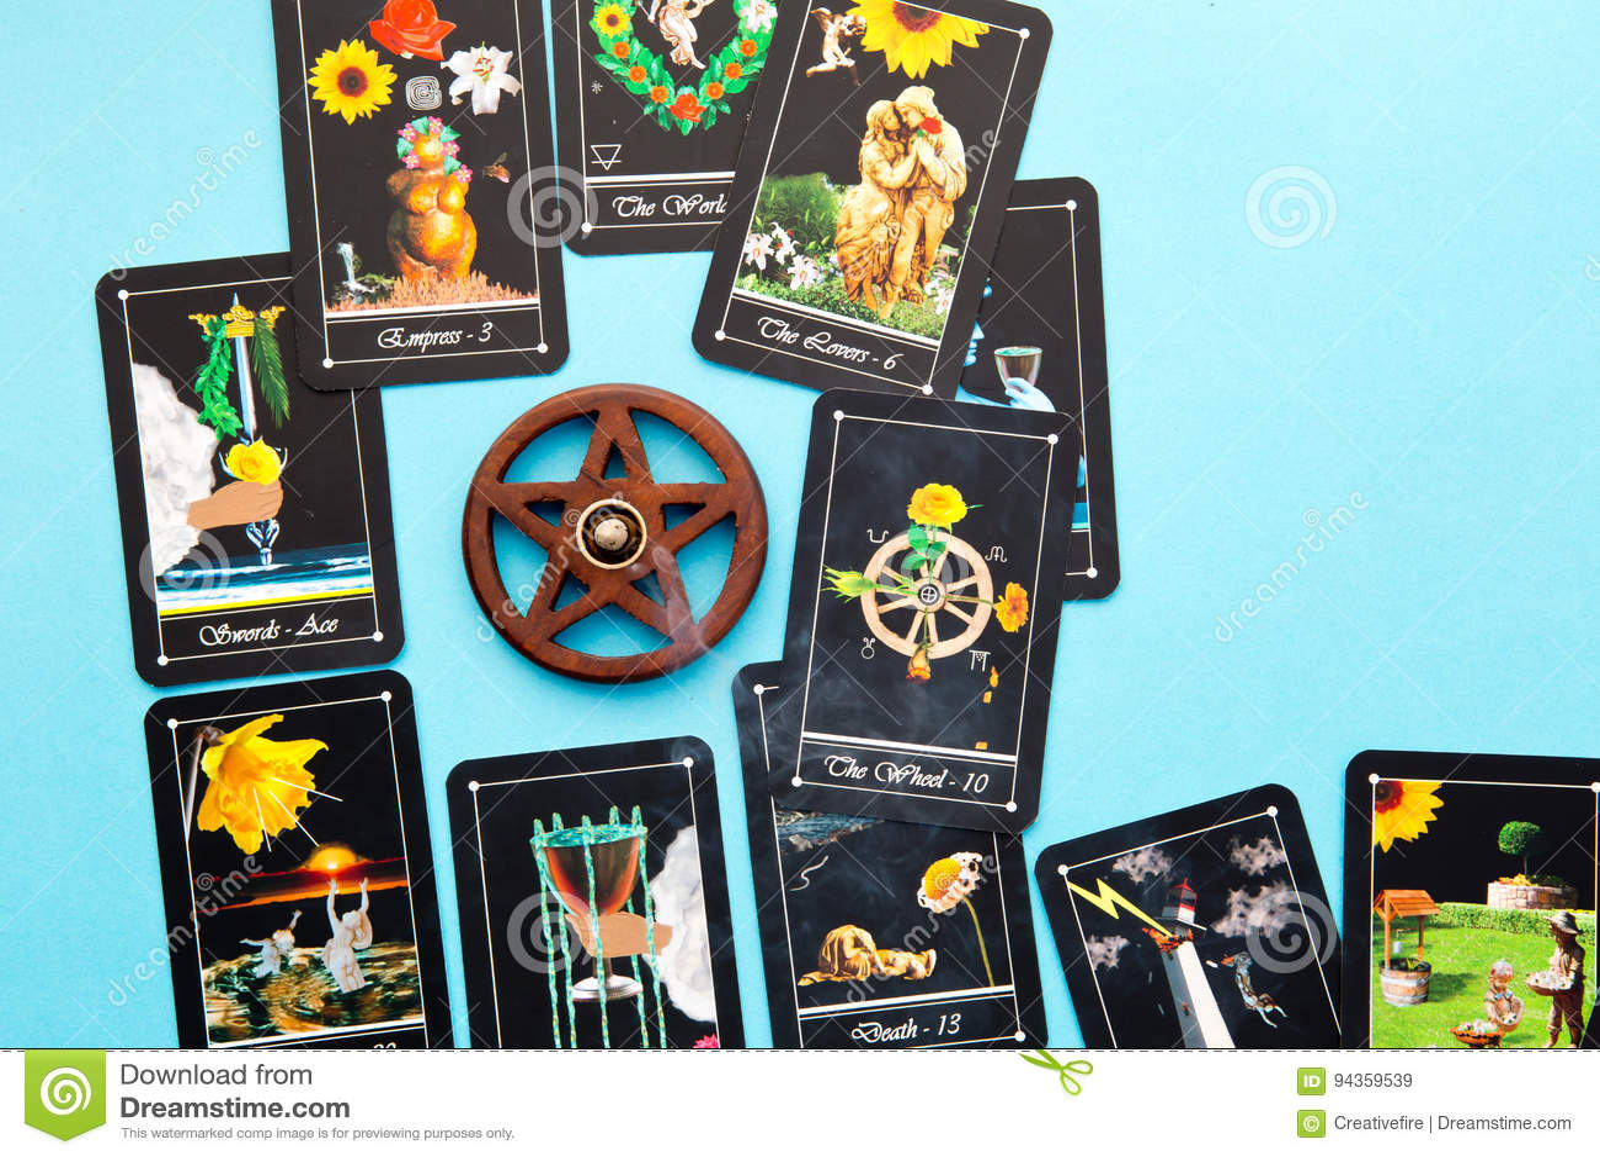 Tarot Deck - Tarot Readings With Wooden Pentagram Incense